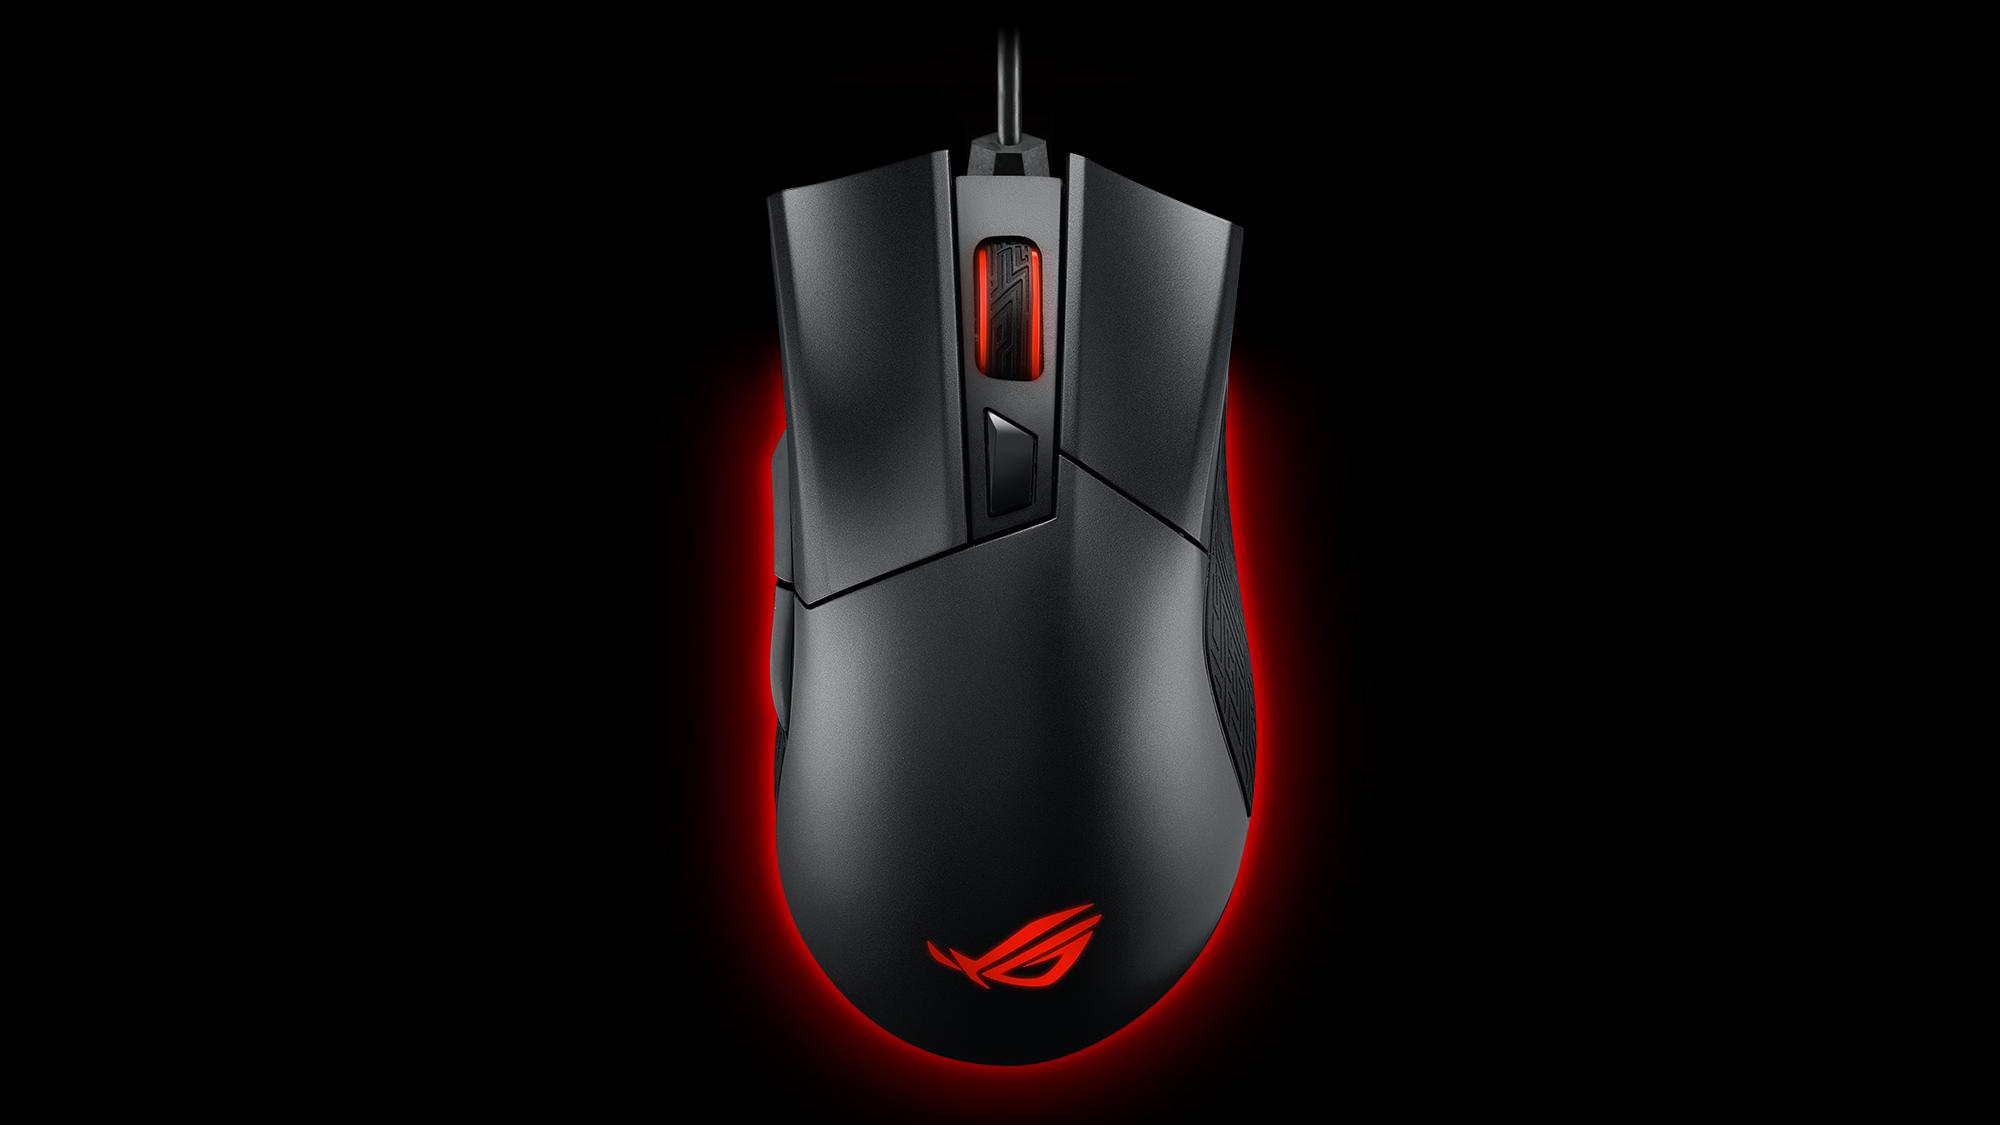 ROG-Gladius-II-2D-1-Red